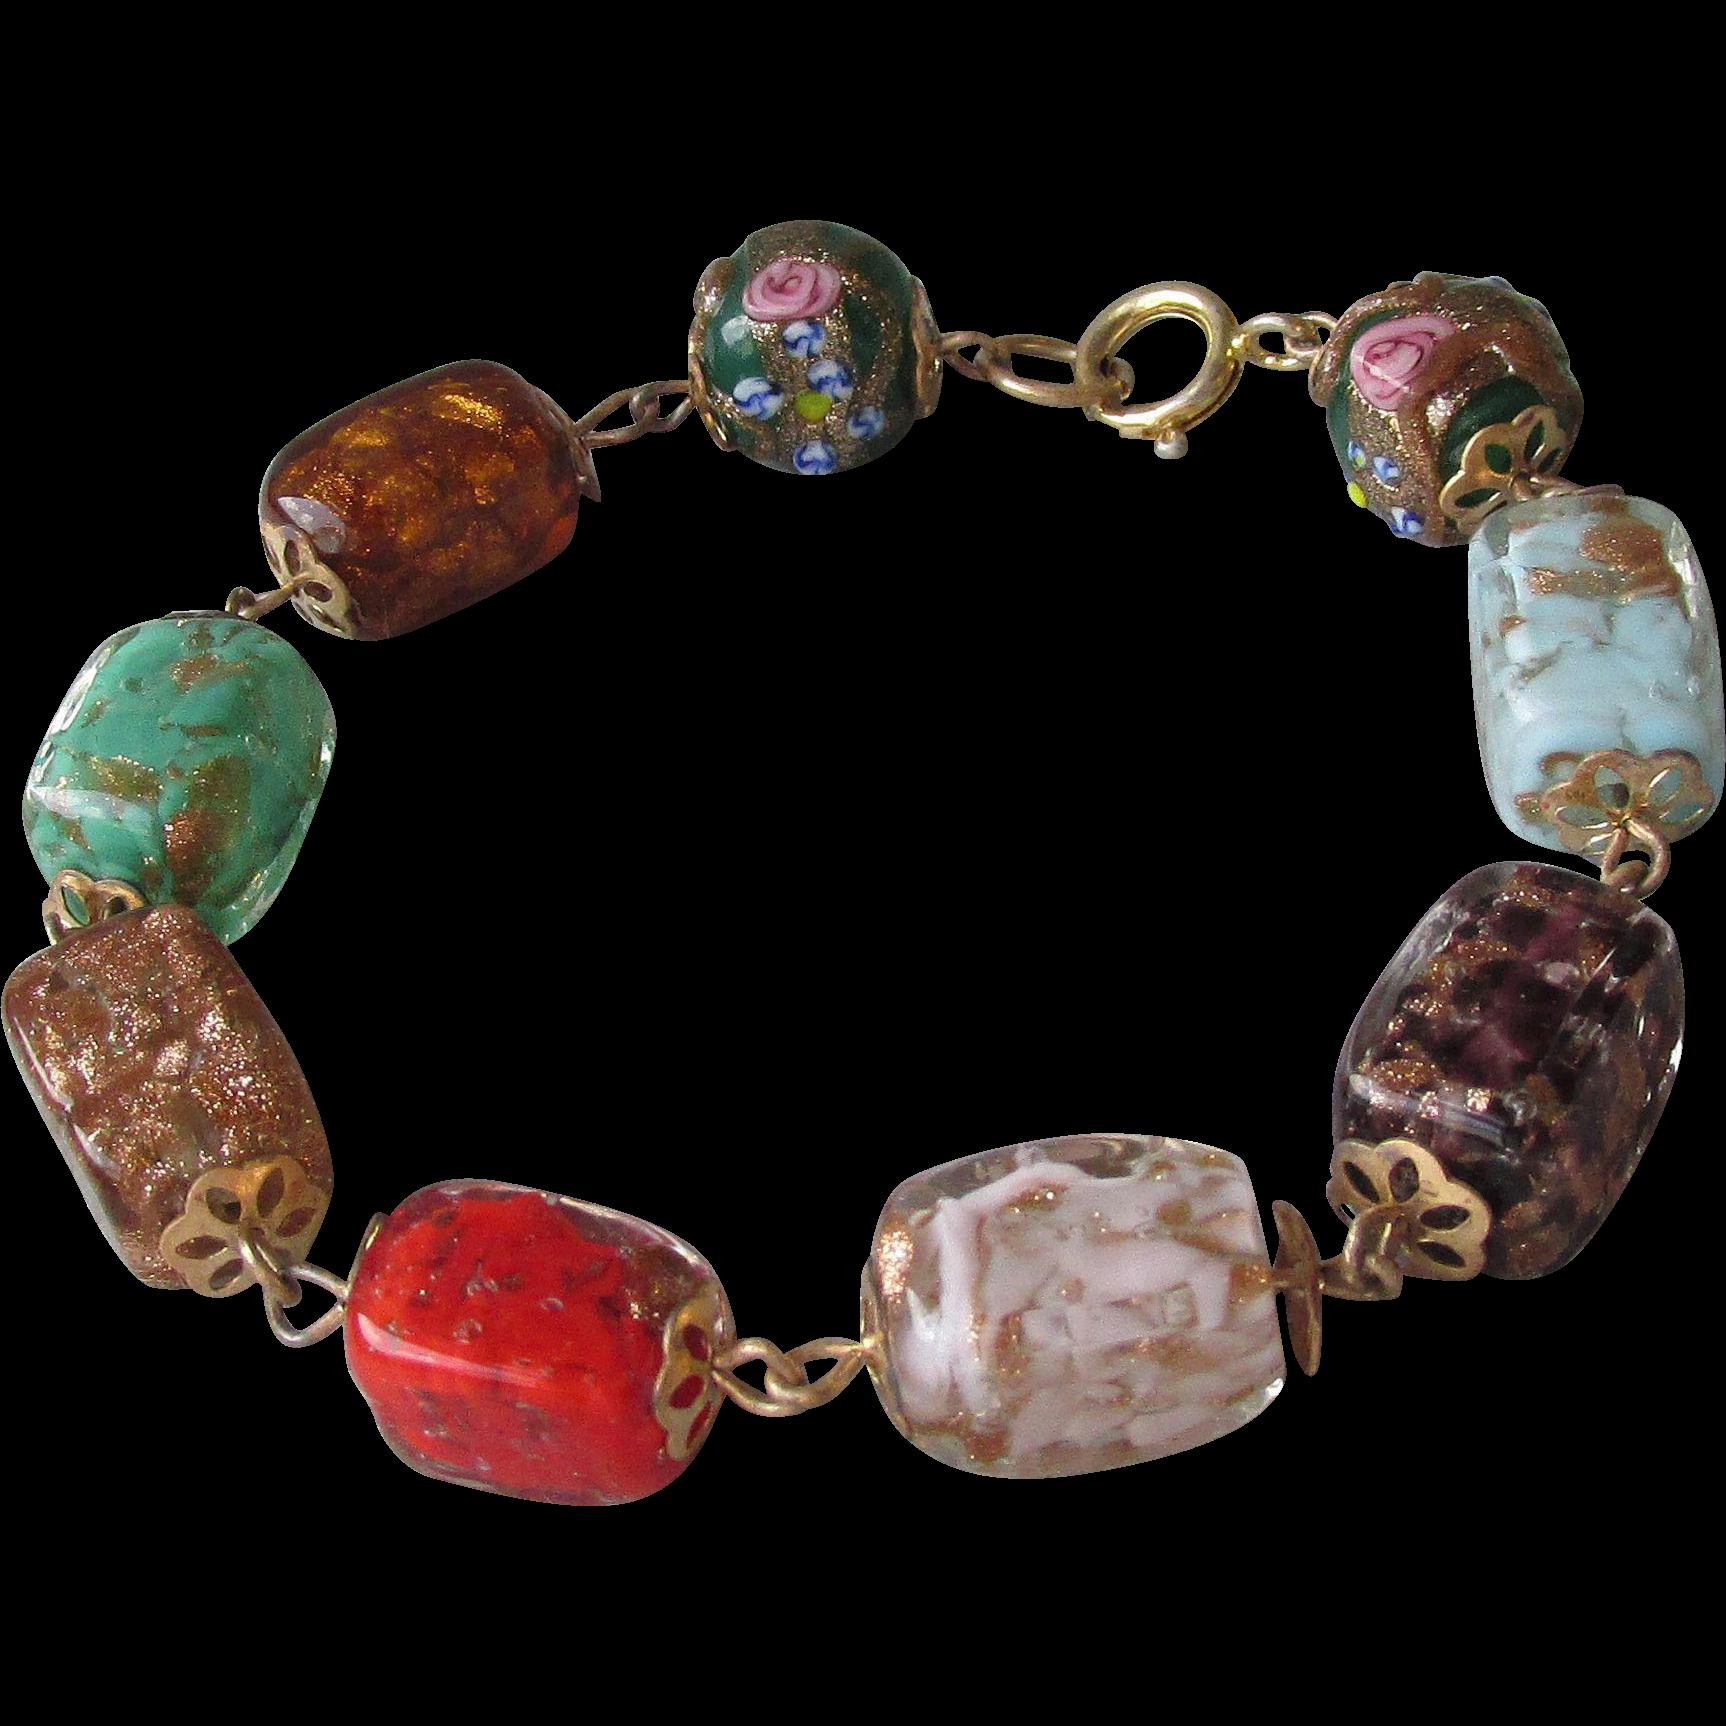 Chunky 1950's Vintage Square Venetian Art Glass Bead Bracelet